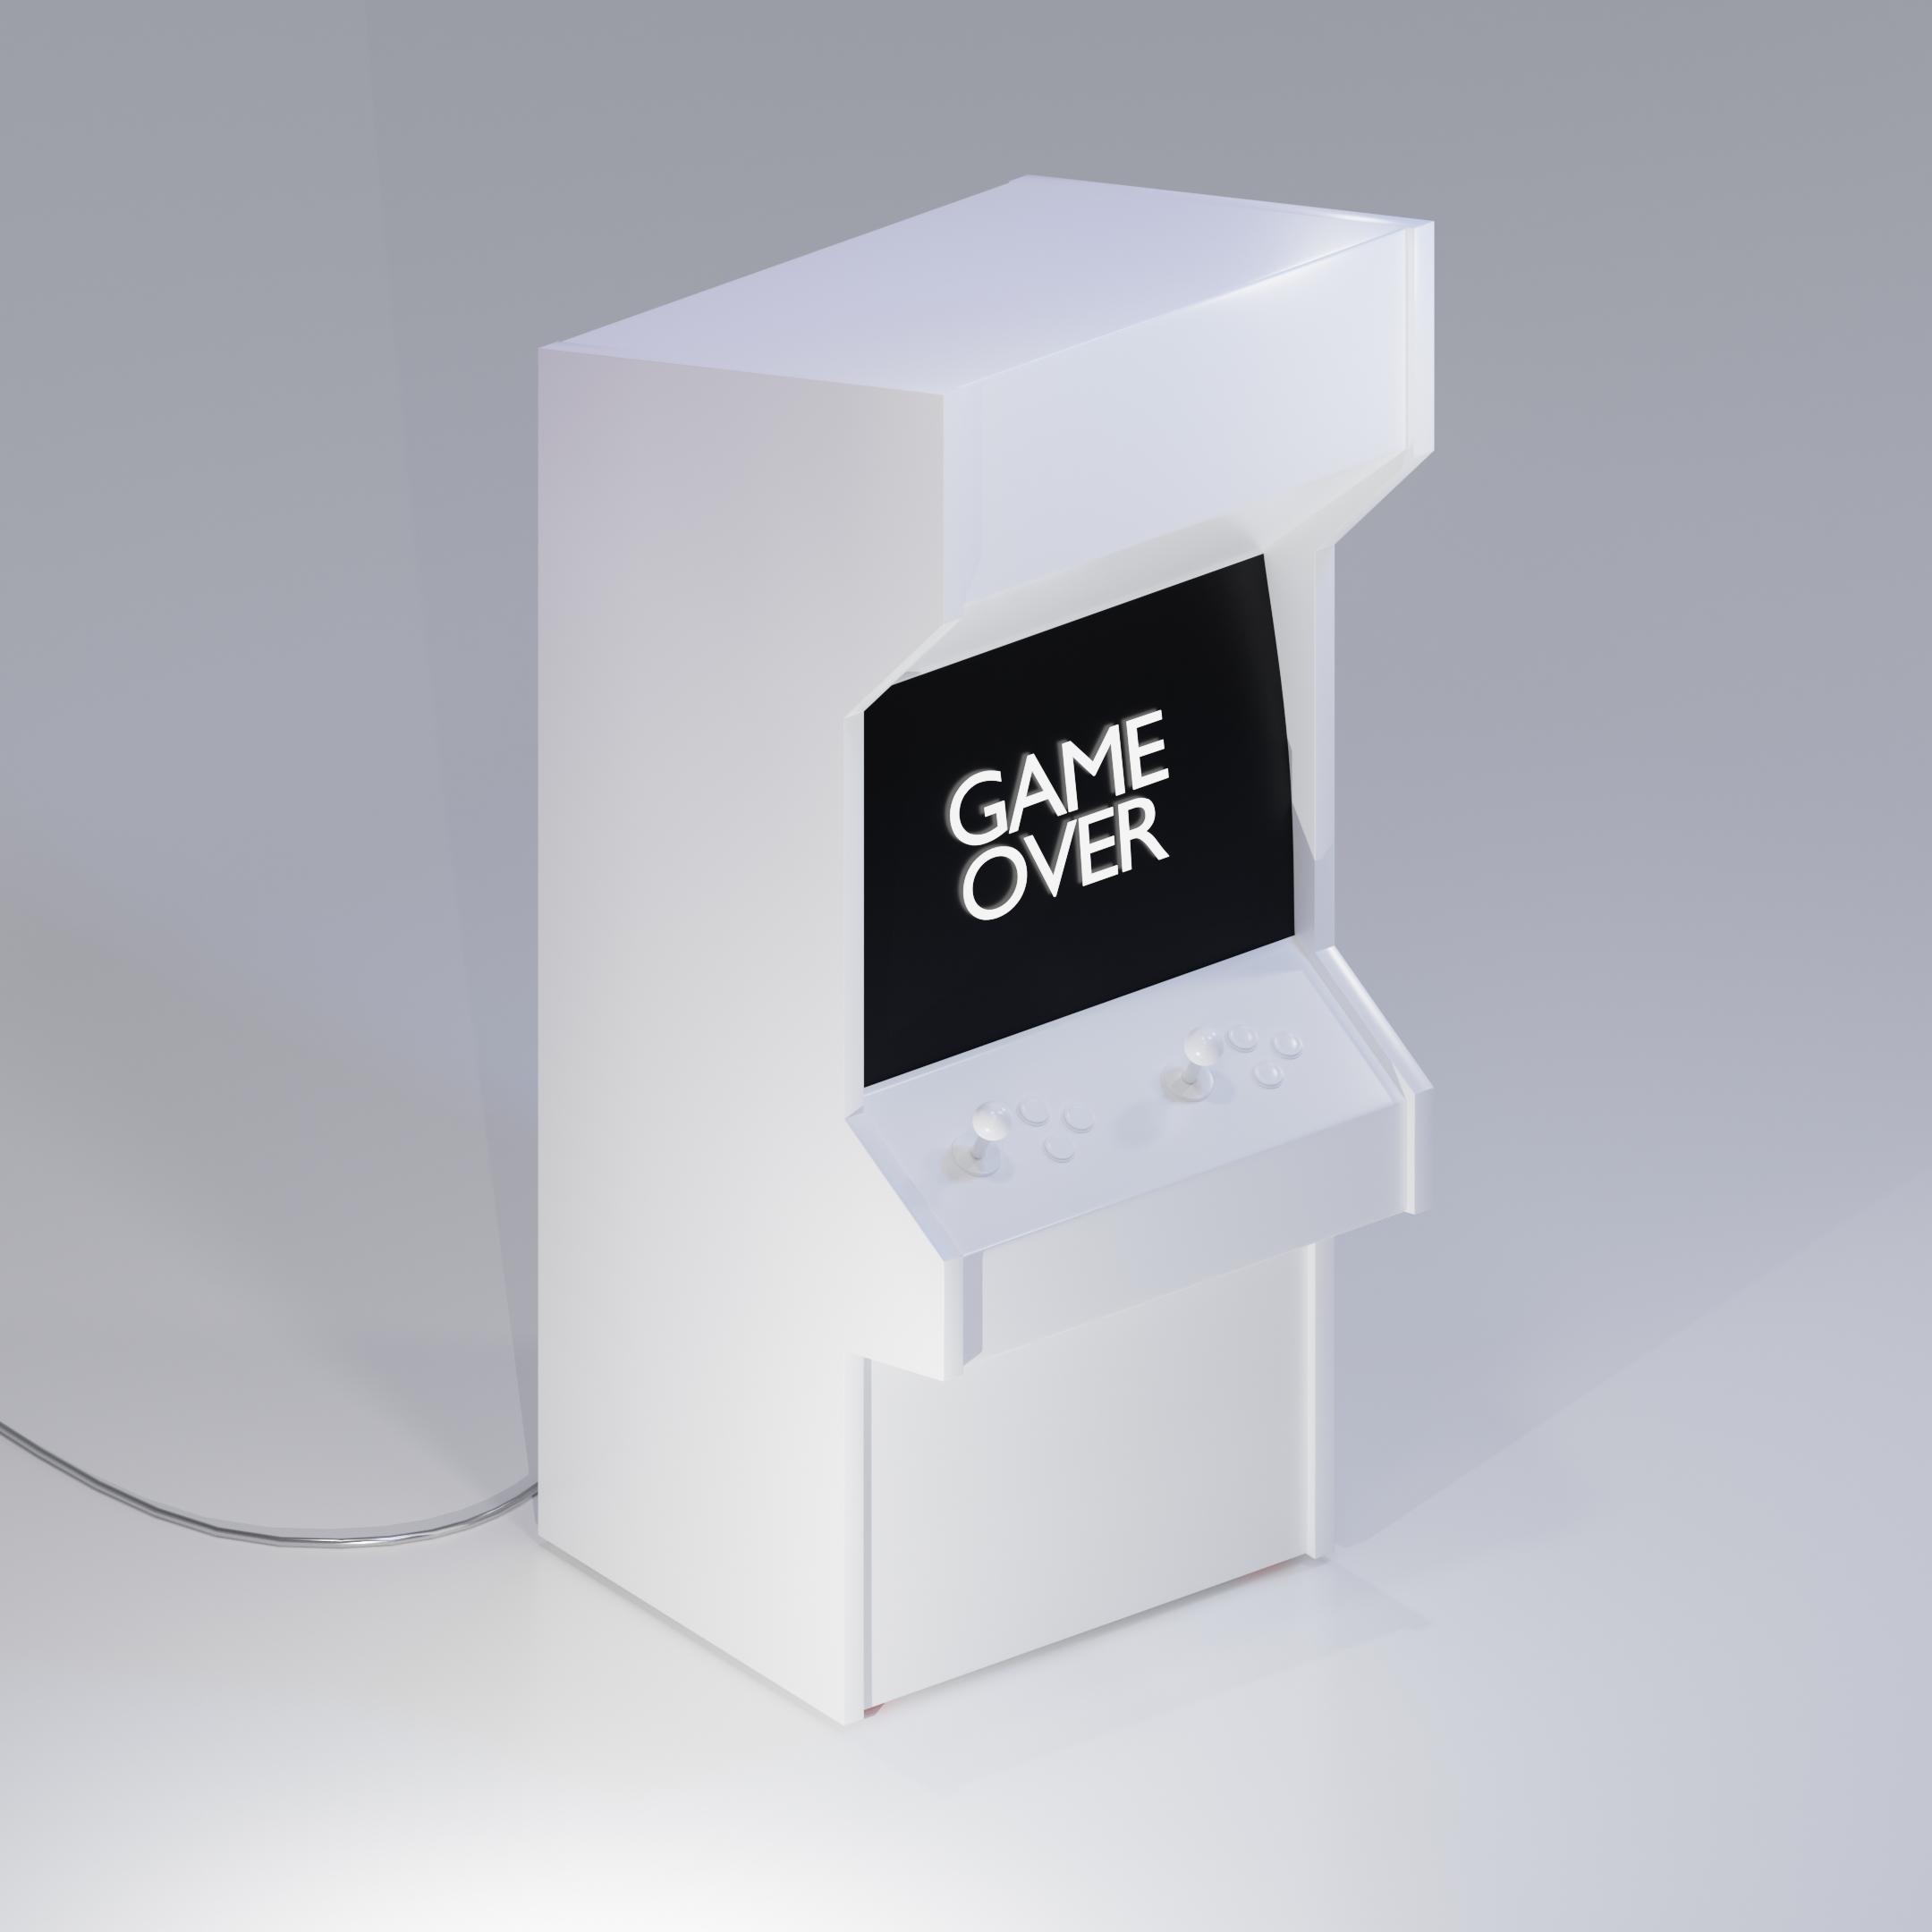 Projekt modelu 3D (Arcade Game) automatu do gier Blender w czerni i bieli